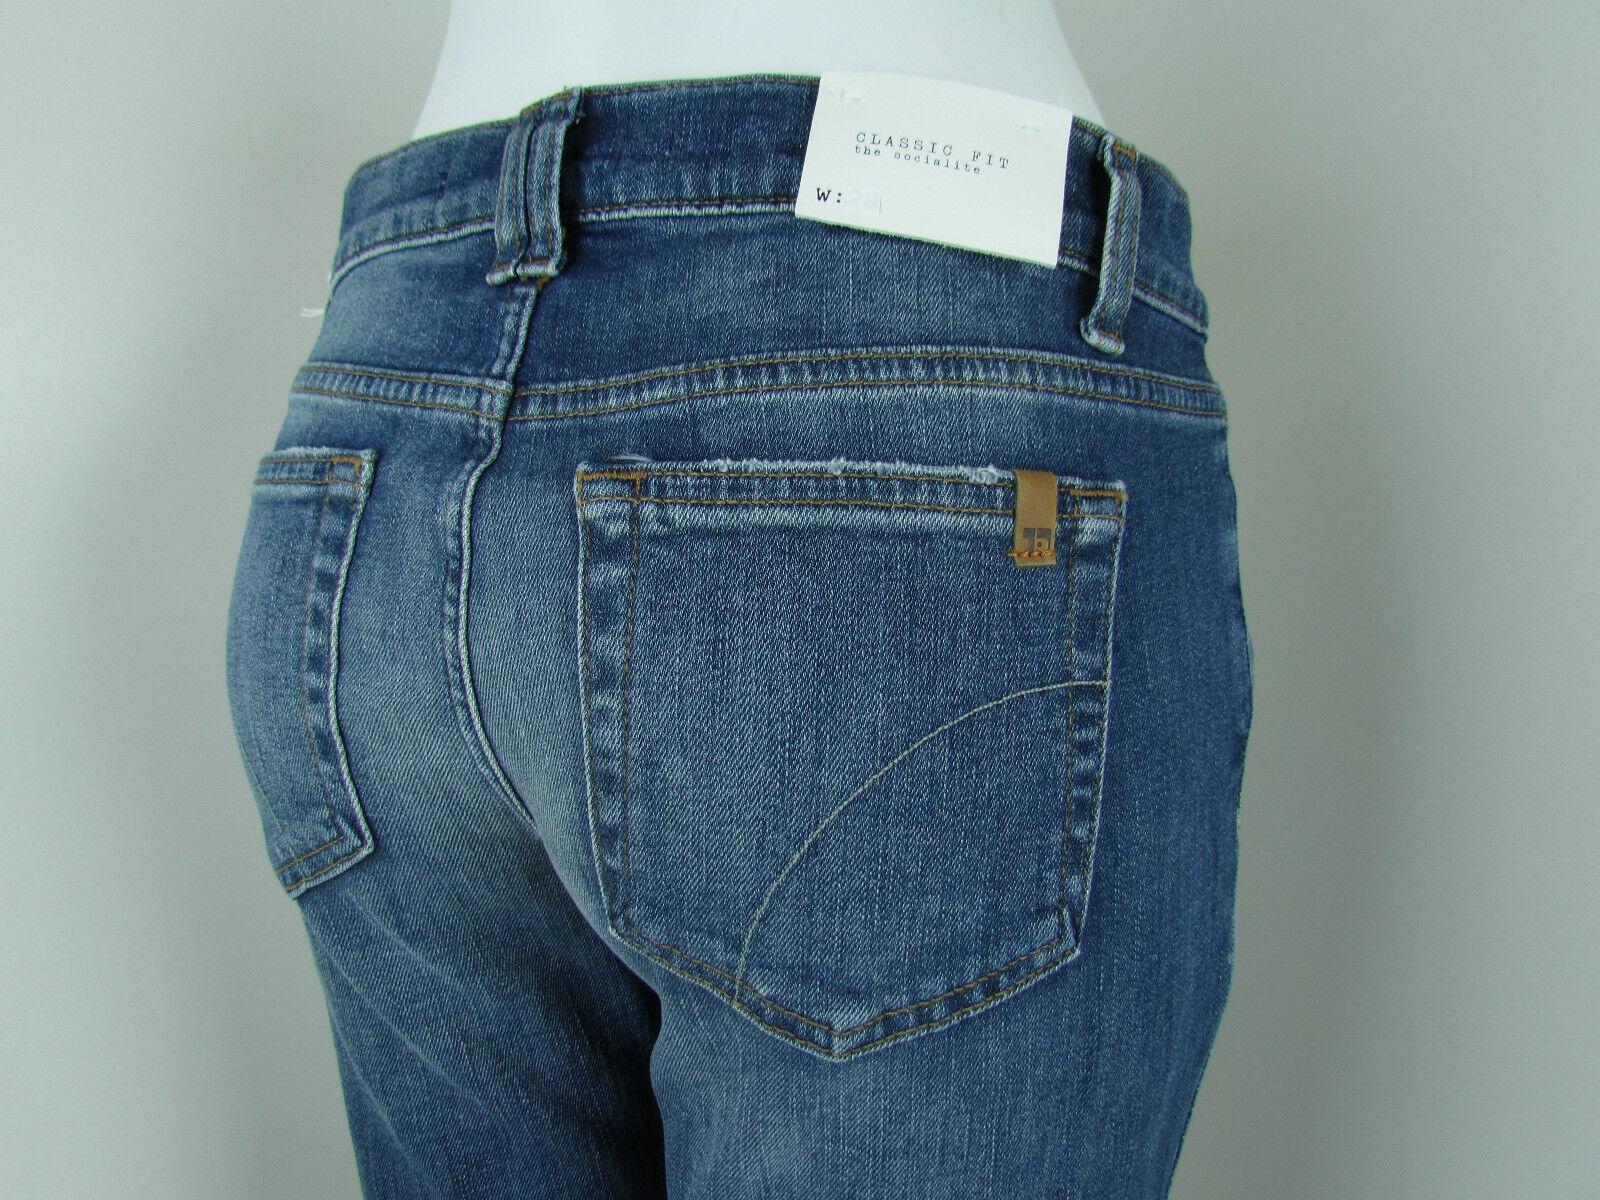 JOE'S Jeans SOCIALITE Classic FIT BOOTCUT Women SZ 28 IN MEDIUM blueE MILLICENT